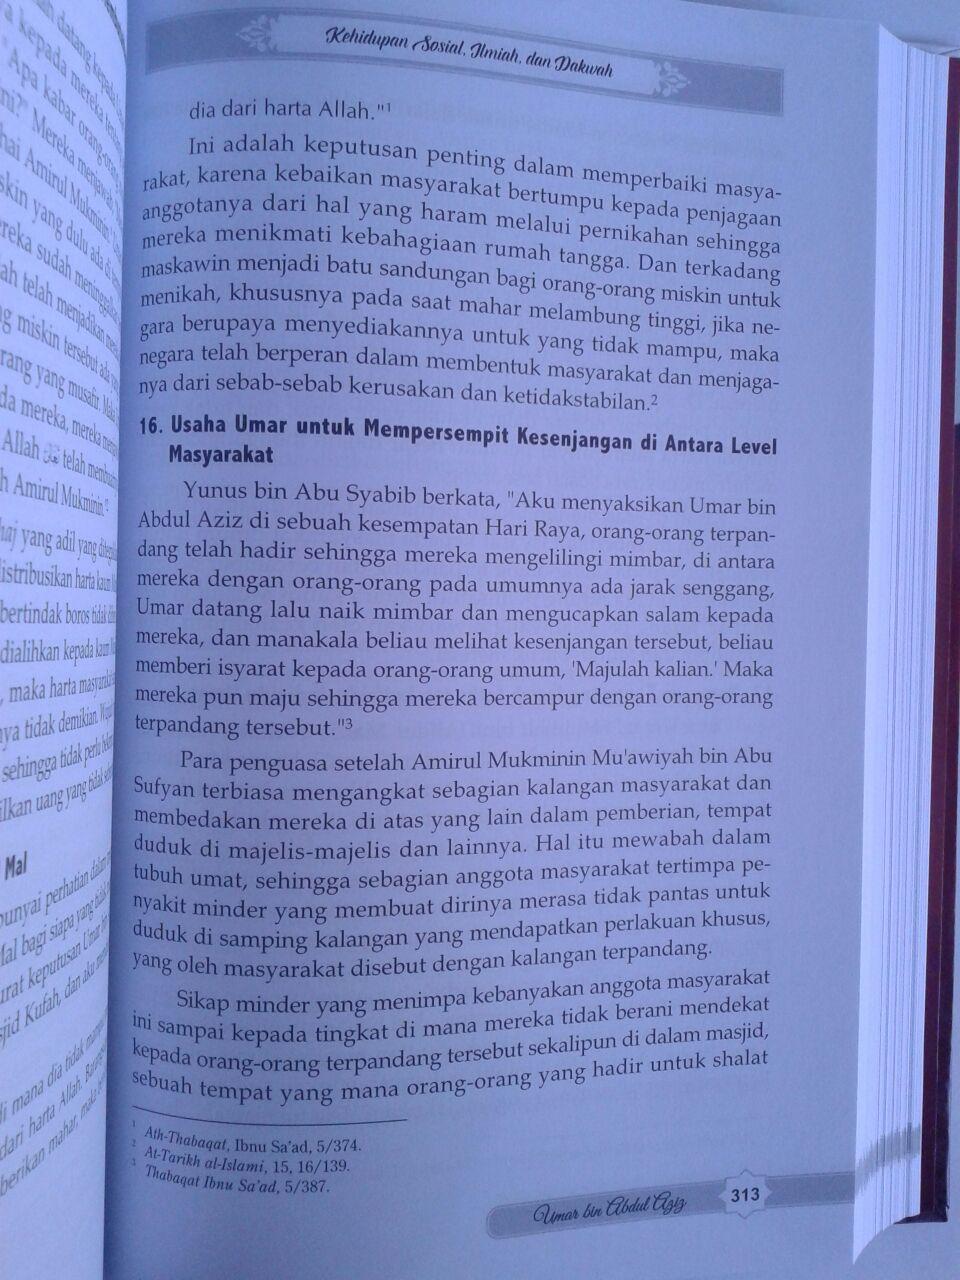 Buku Perjalanan Hidup Khalifah Yang Agung Umar Bin Abdul Aziz Ulama Dan Pemimpin Yang Adil isi 3